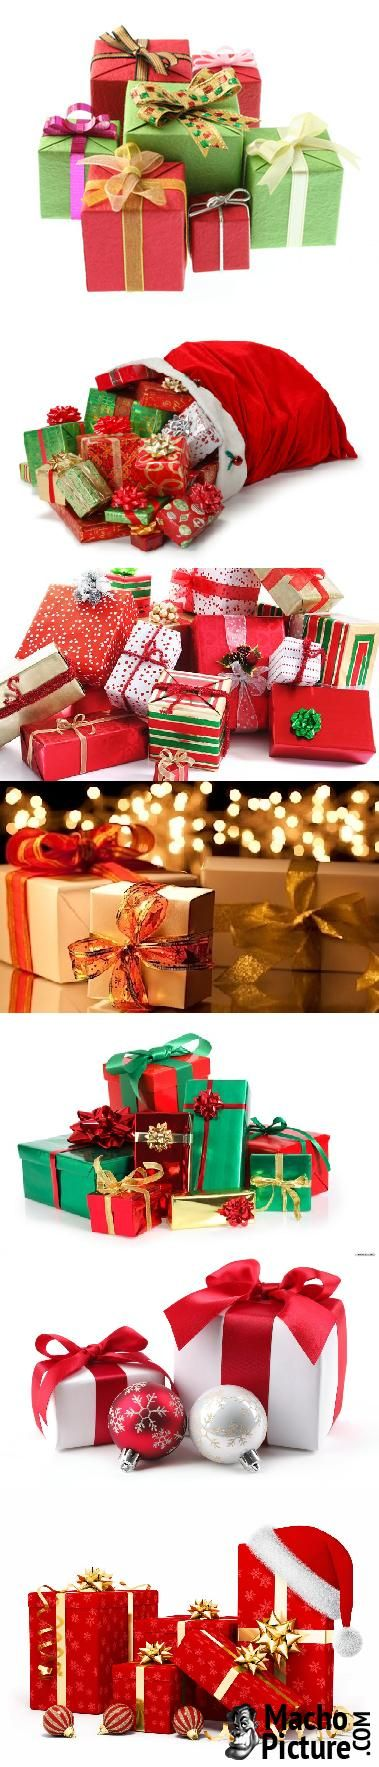 Christmas gifts - 8 PHOTO!